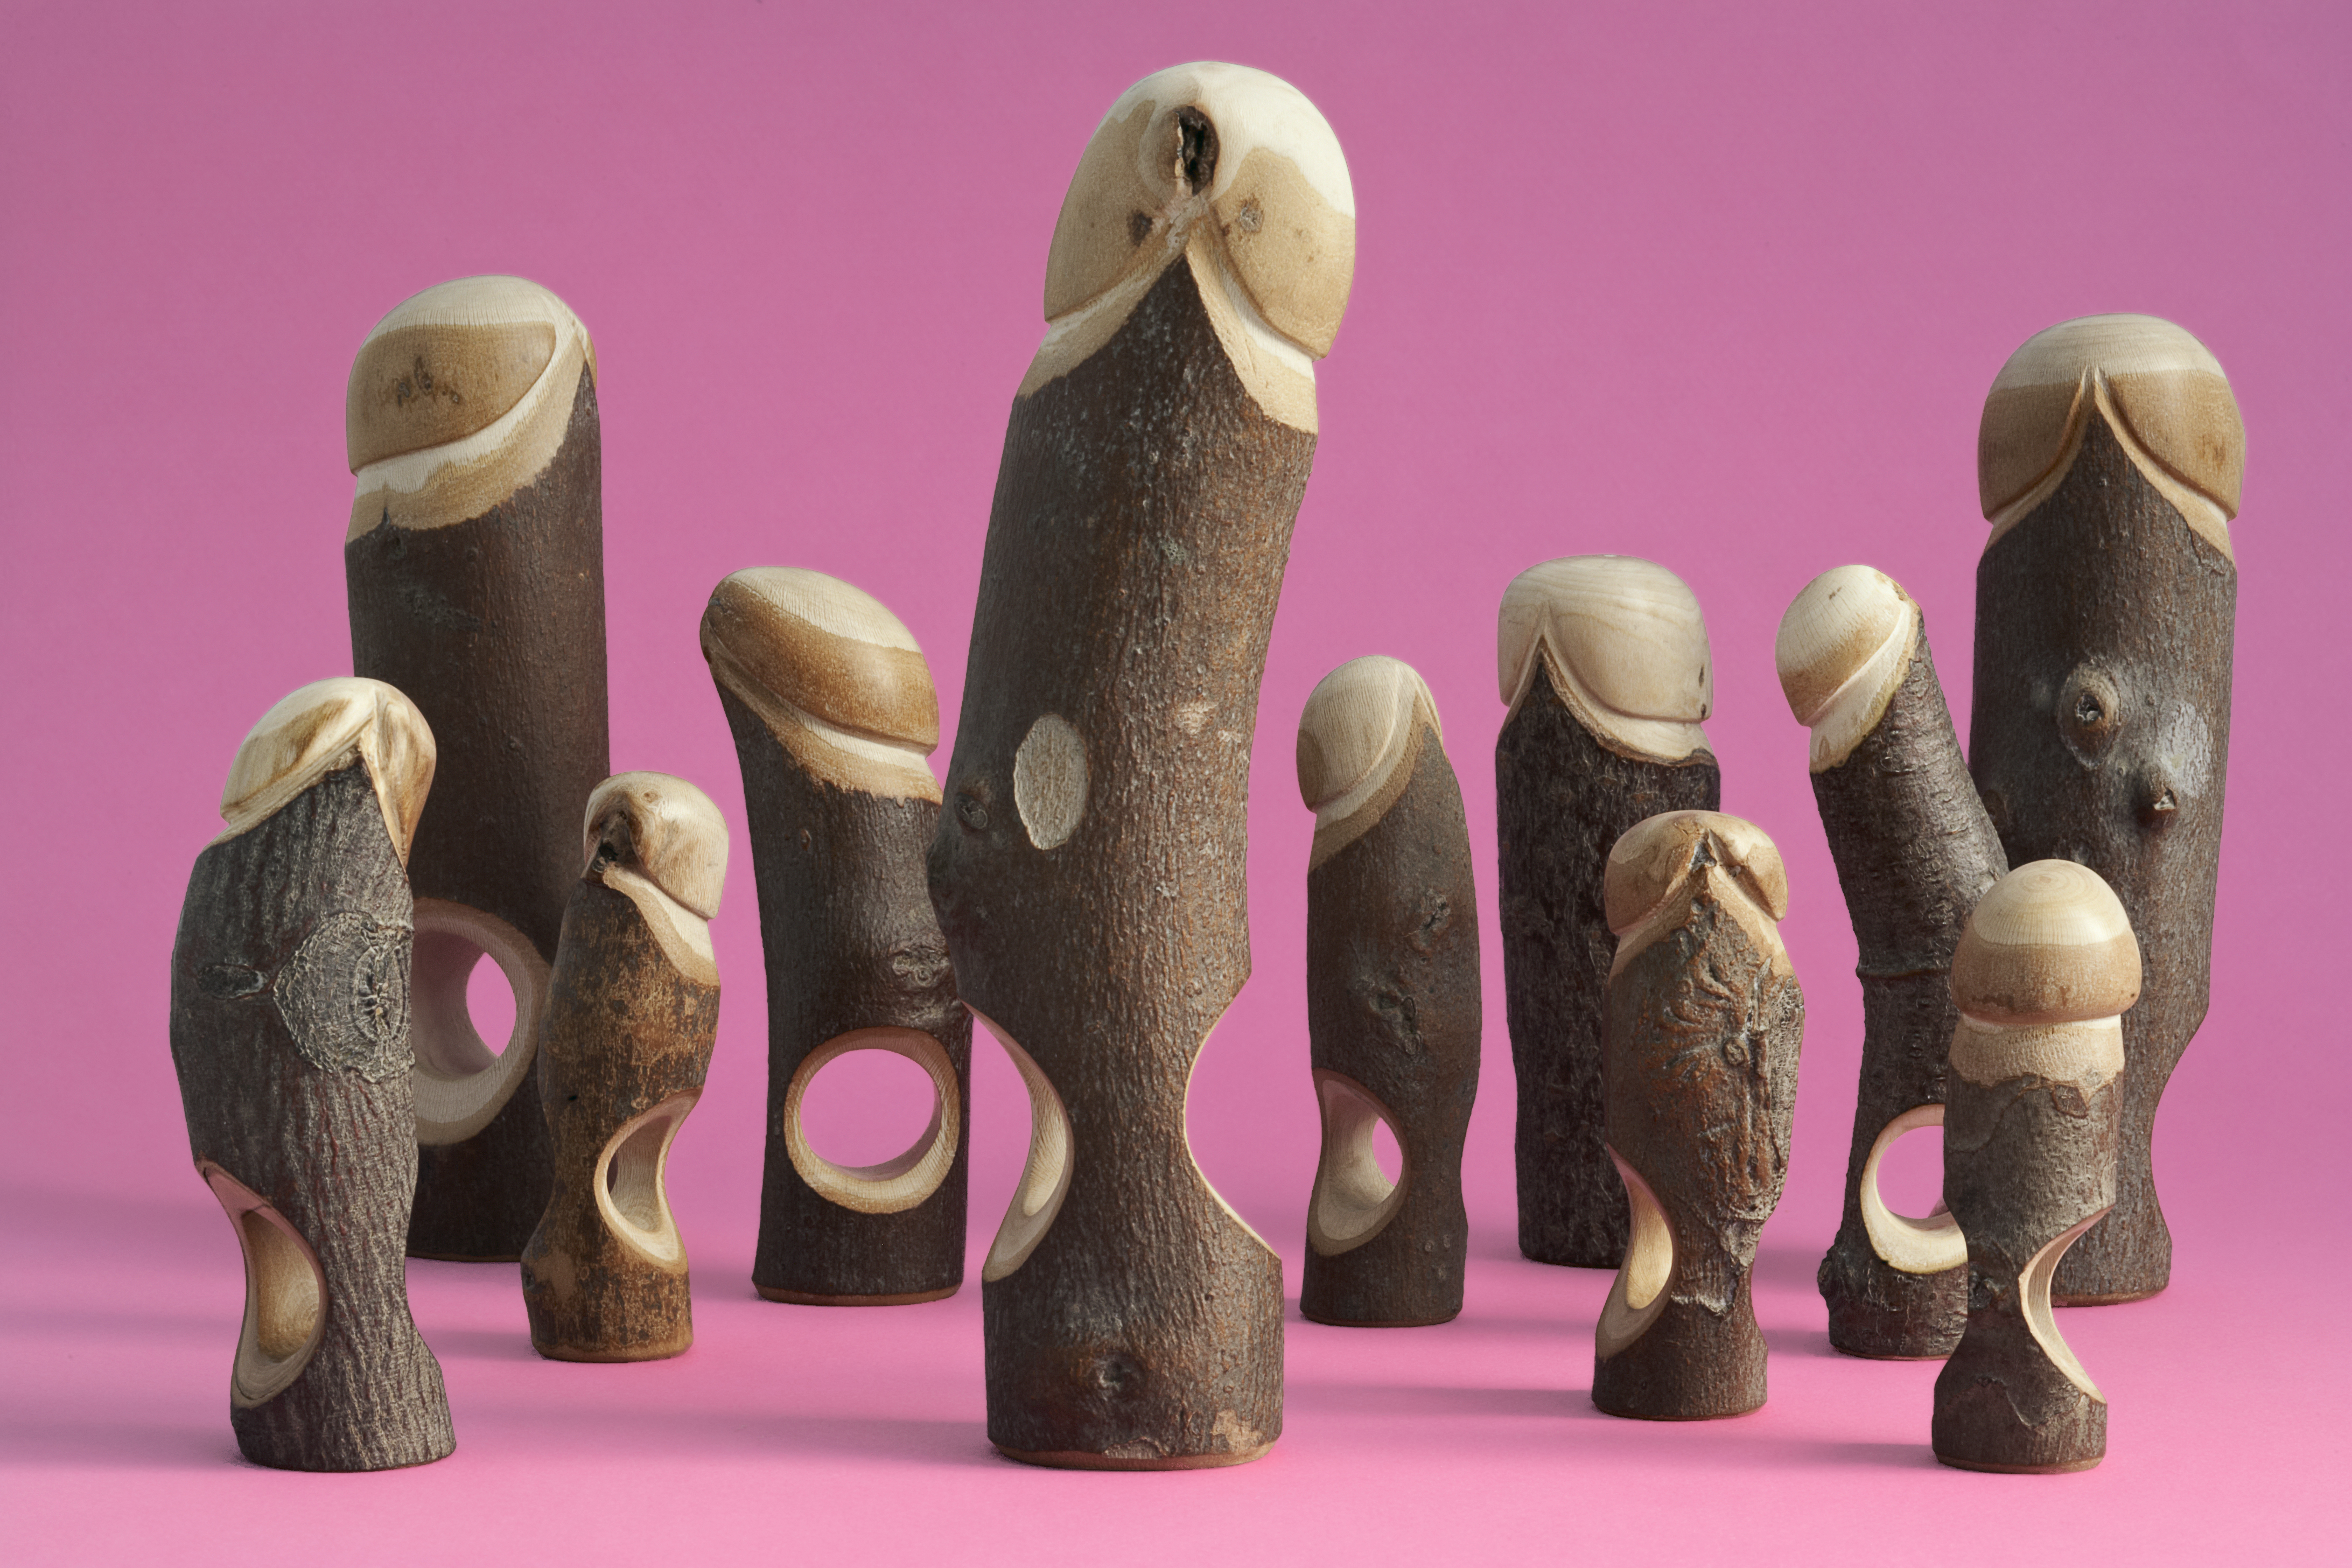 Susanne Klemm, Red Light Collectie, Wood, ringen, 2008. Foto met dank aan Susanne Klemm©